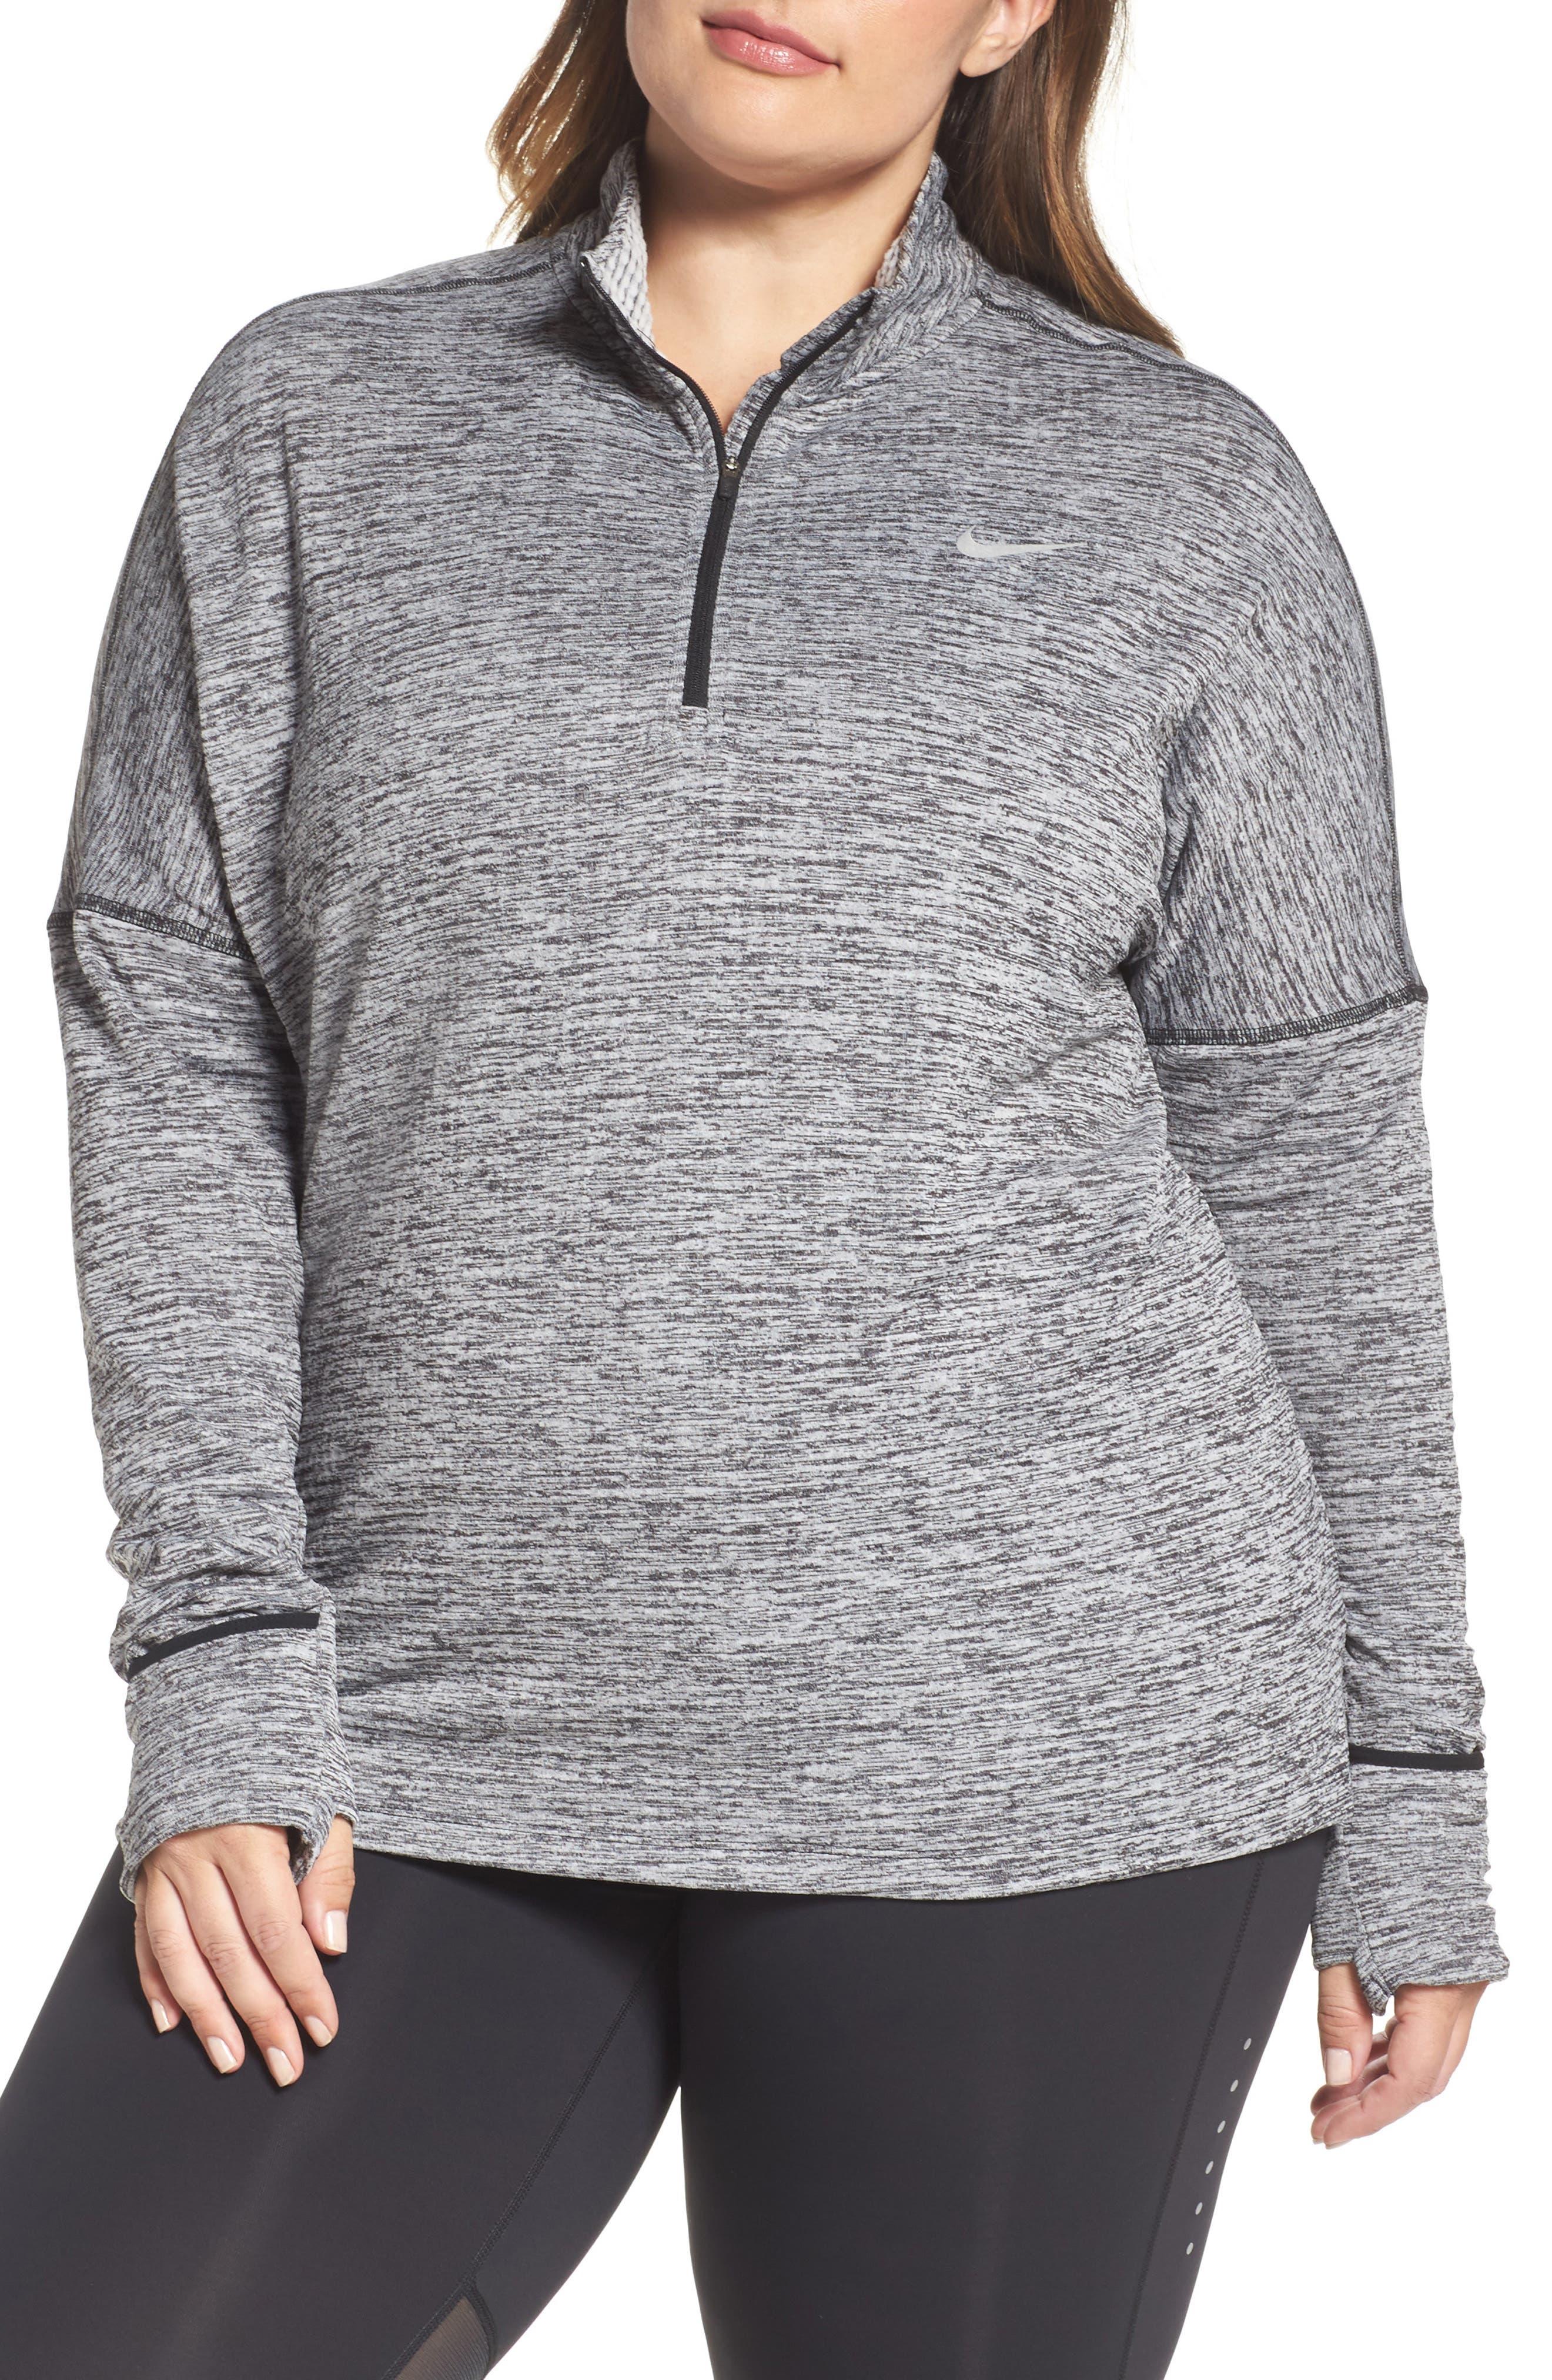 Nike Sphere Element Long Sleeve Running Top (Plus Size)